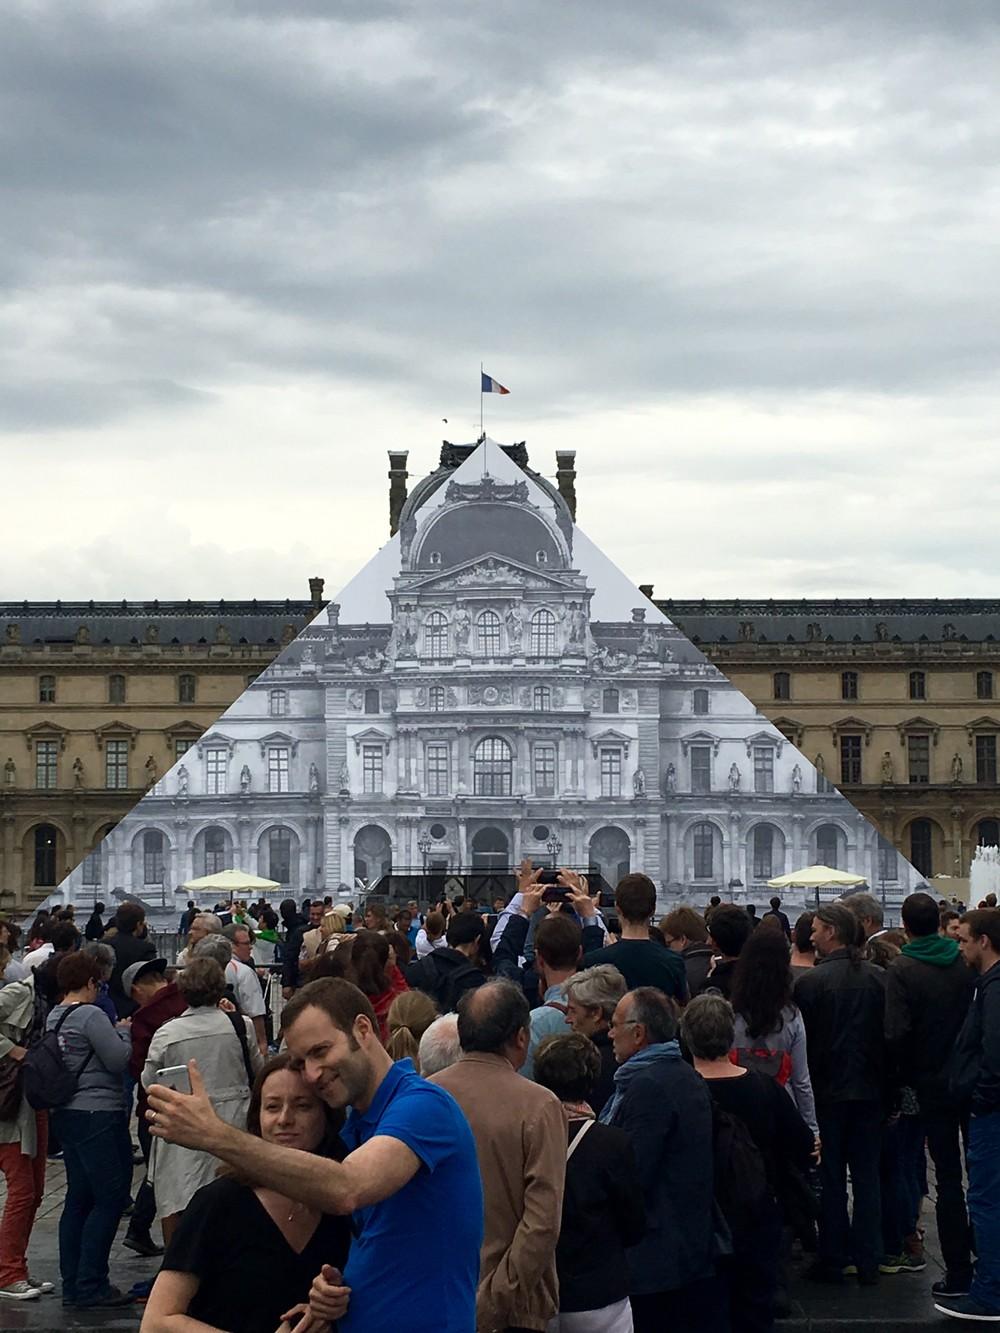 jr-artiste-contemporain-art-photo-restaurarte-galerie-perrotin-paris-le-havre-decade-louvre-restauration-pyramide.jpg